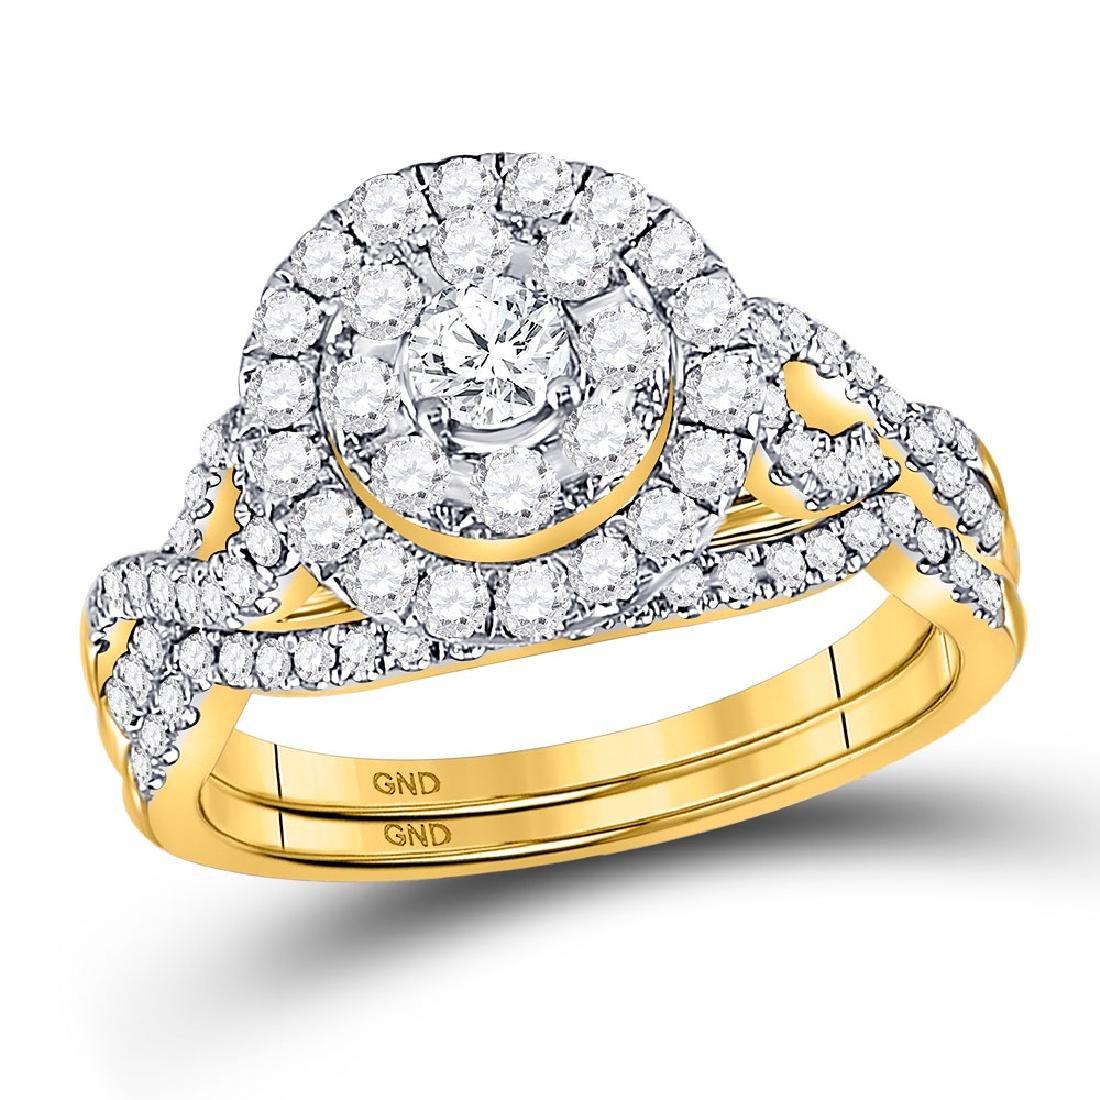 Diamond Bridal Wedding Engagement Ring 14kt Yellow Gold